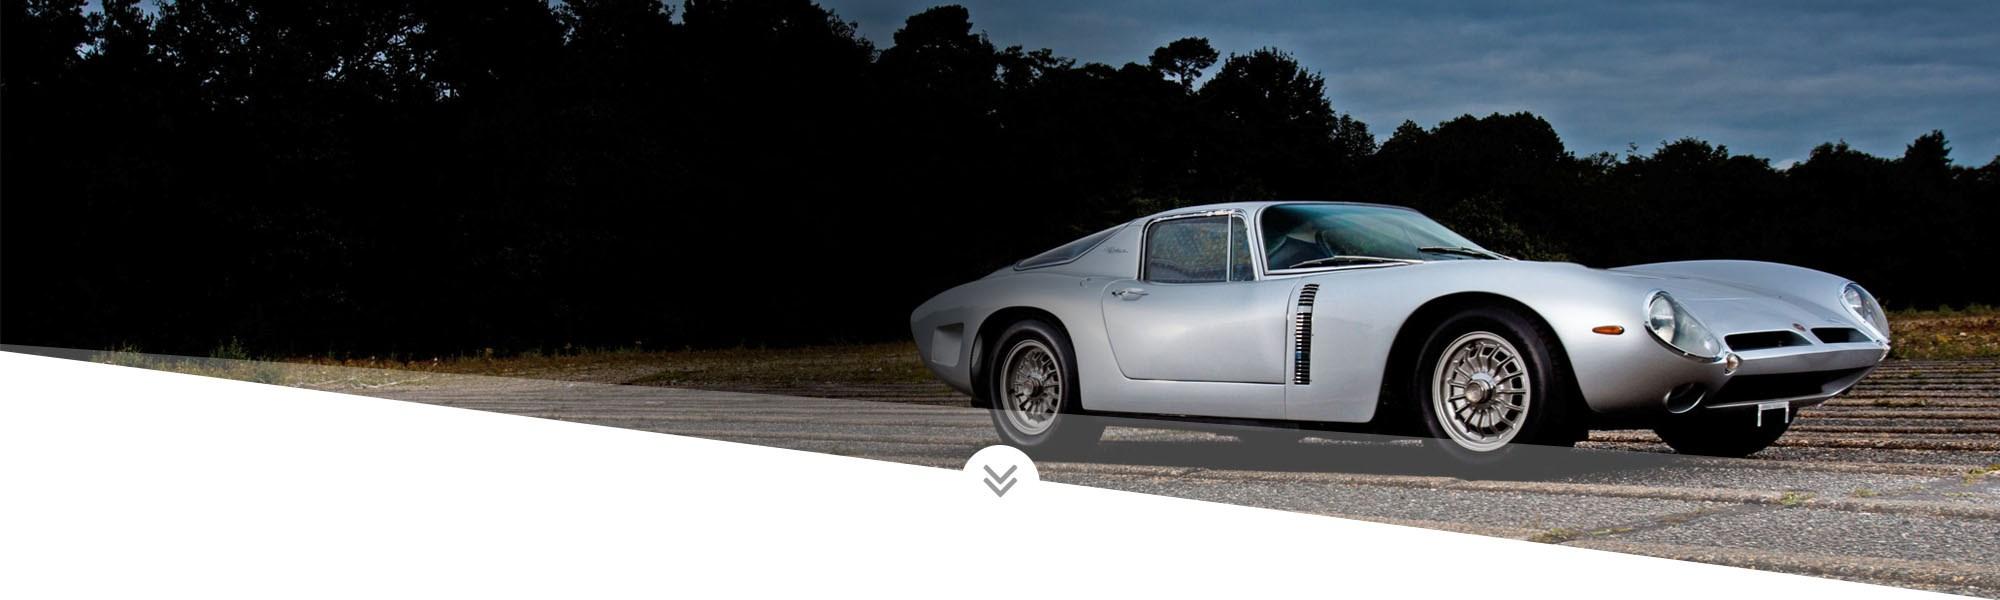 Classic & Sports Car - Haymarket